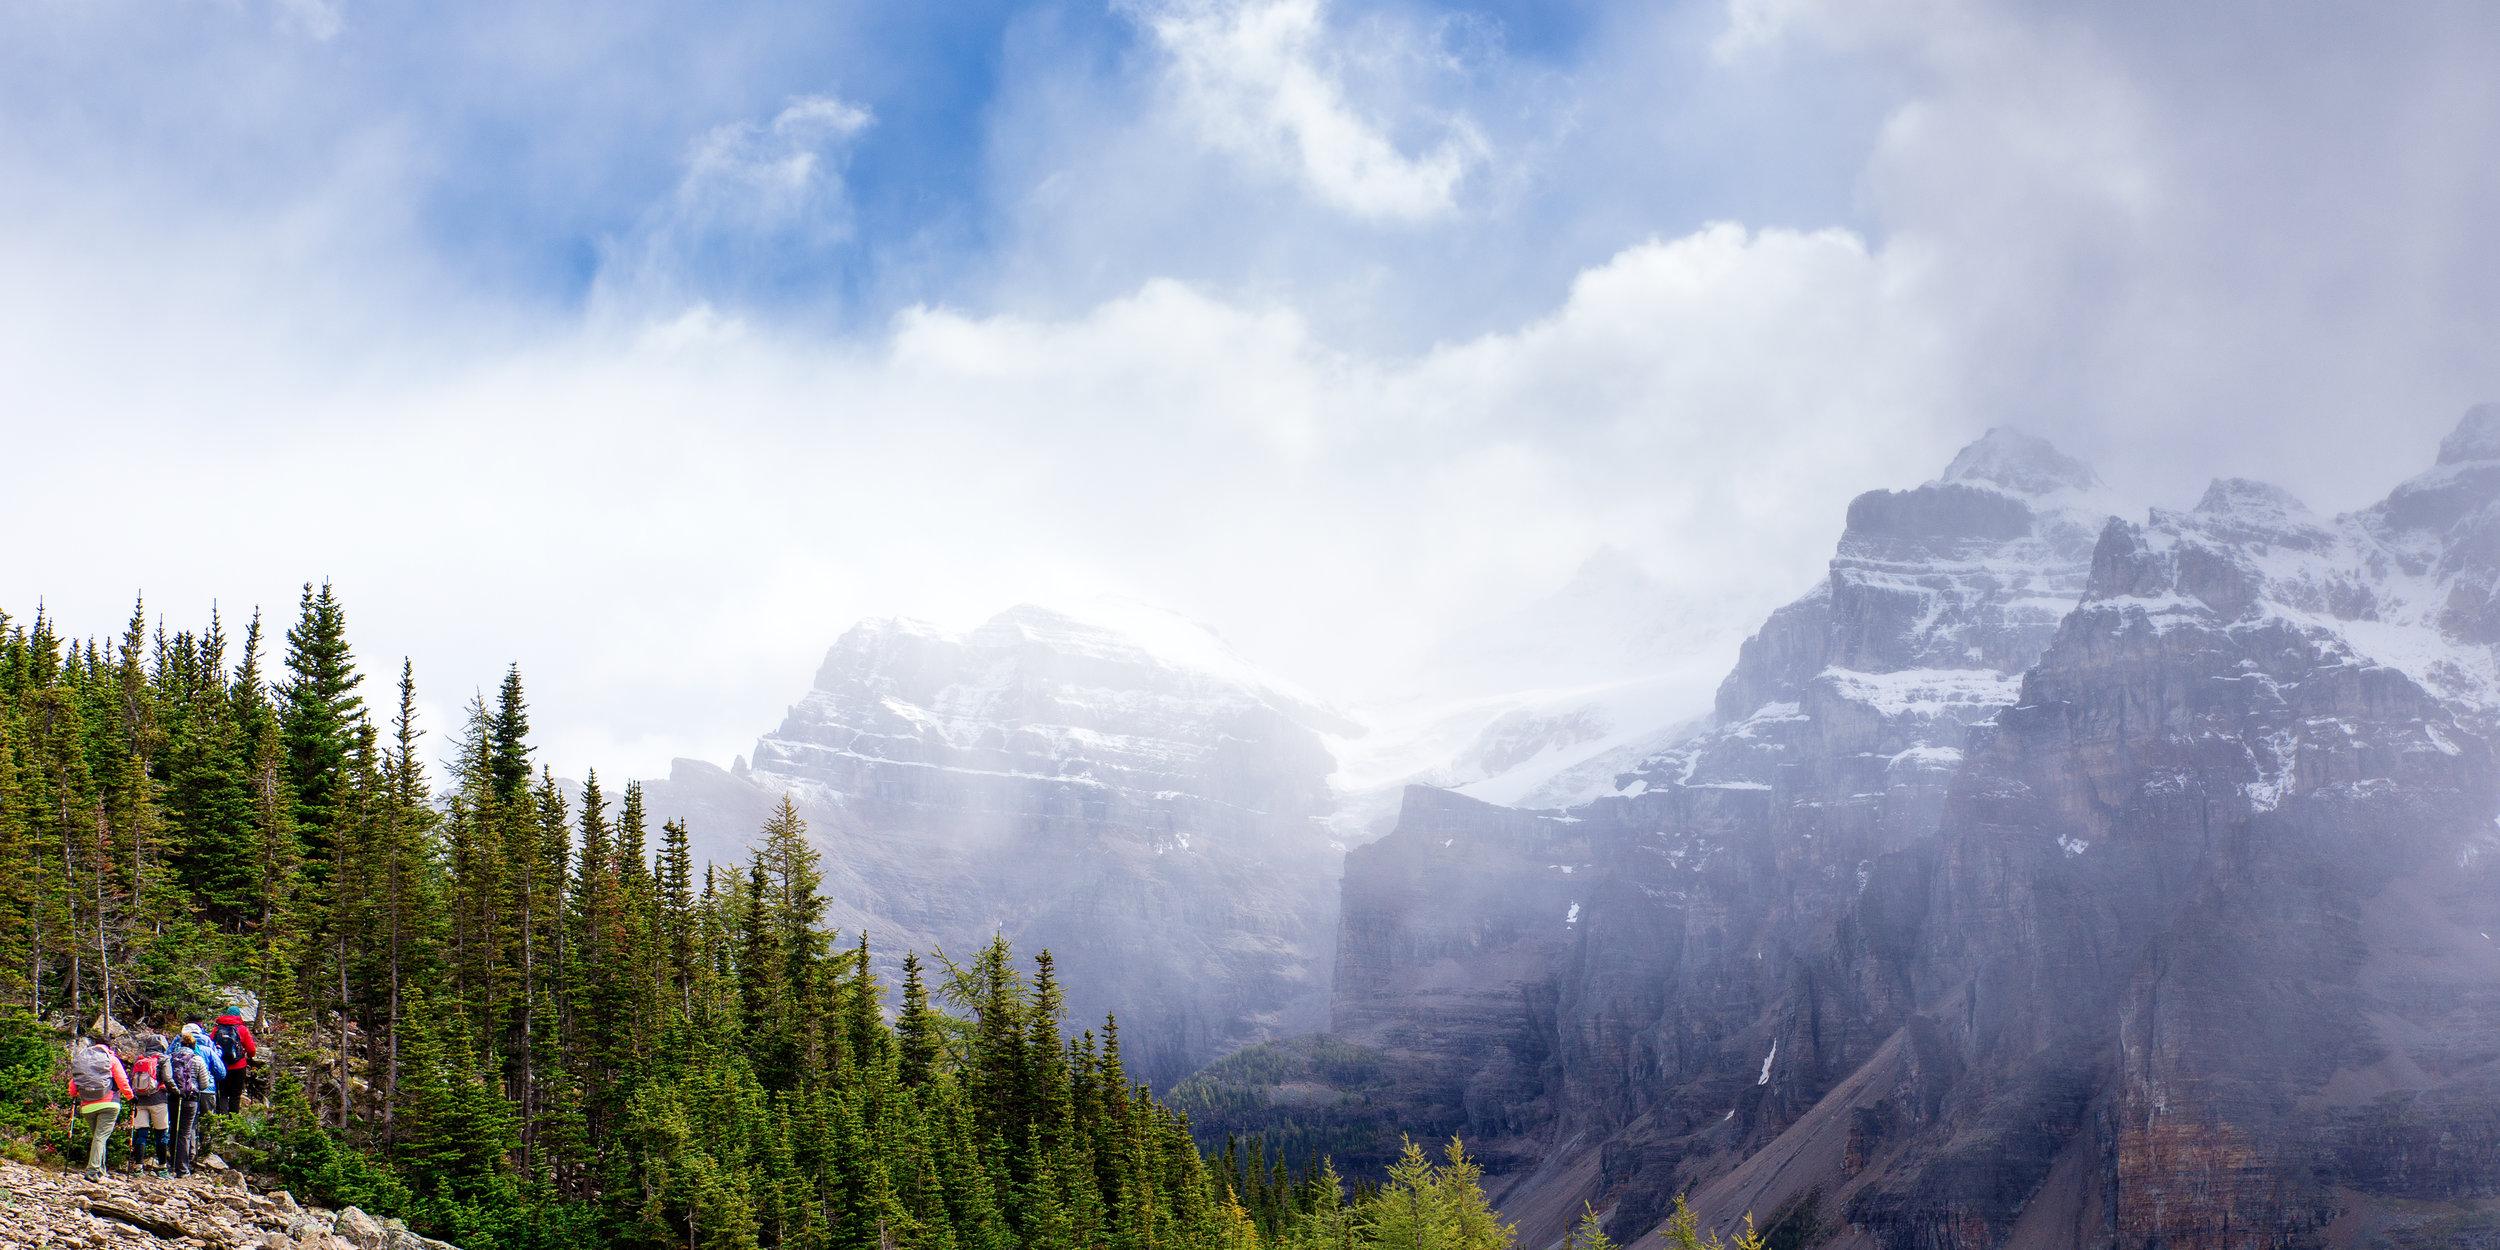 Banff-Sept-2016-033-10x20-PRINT.jpg